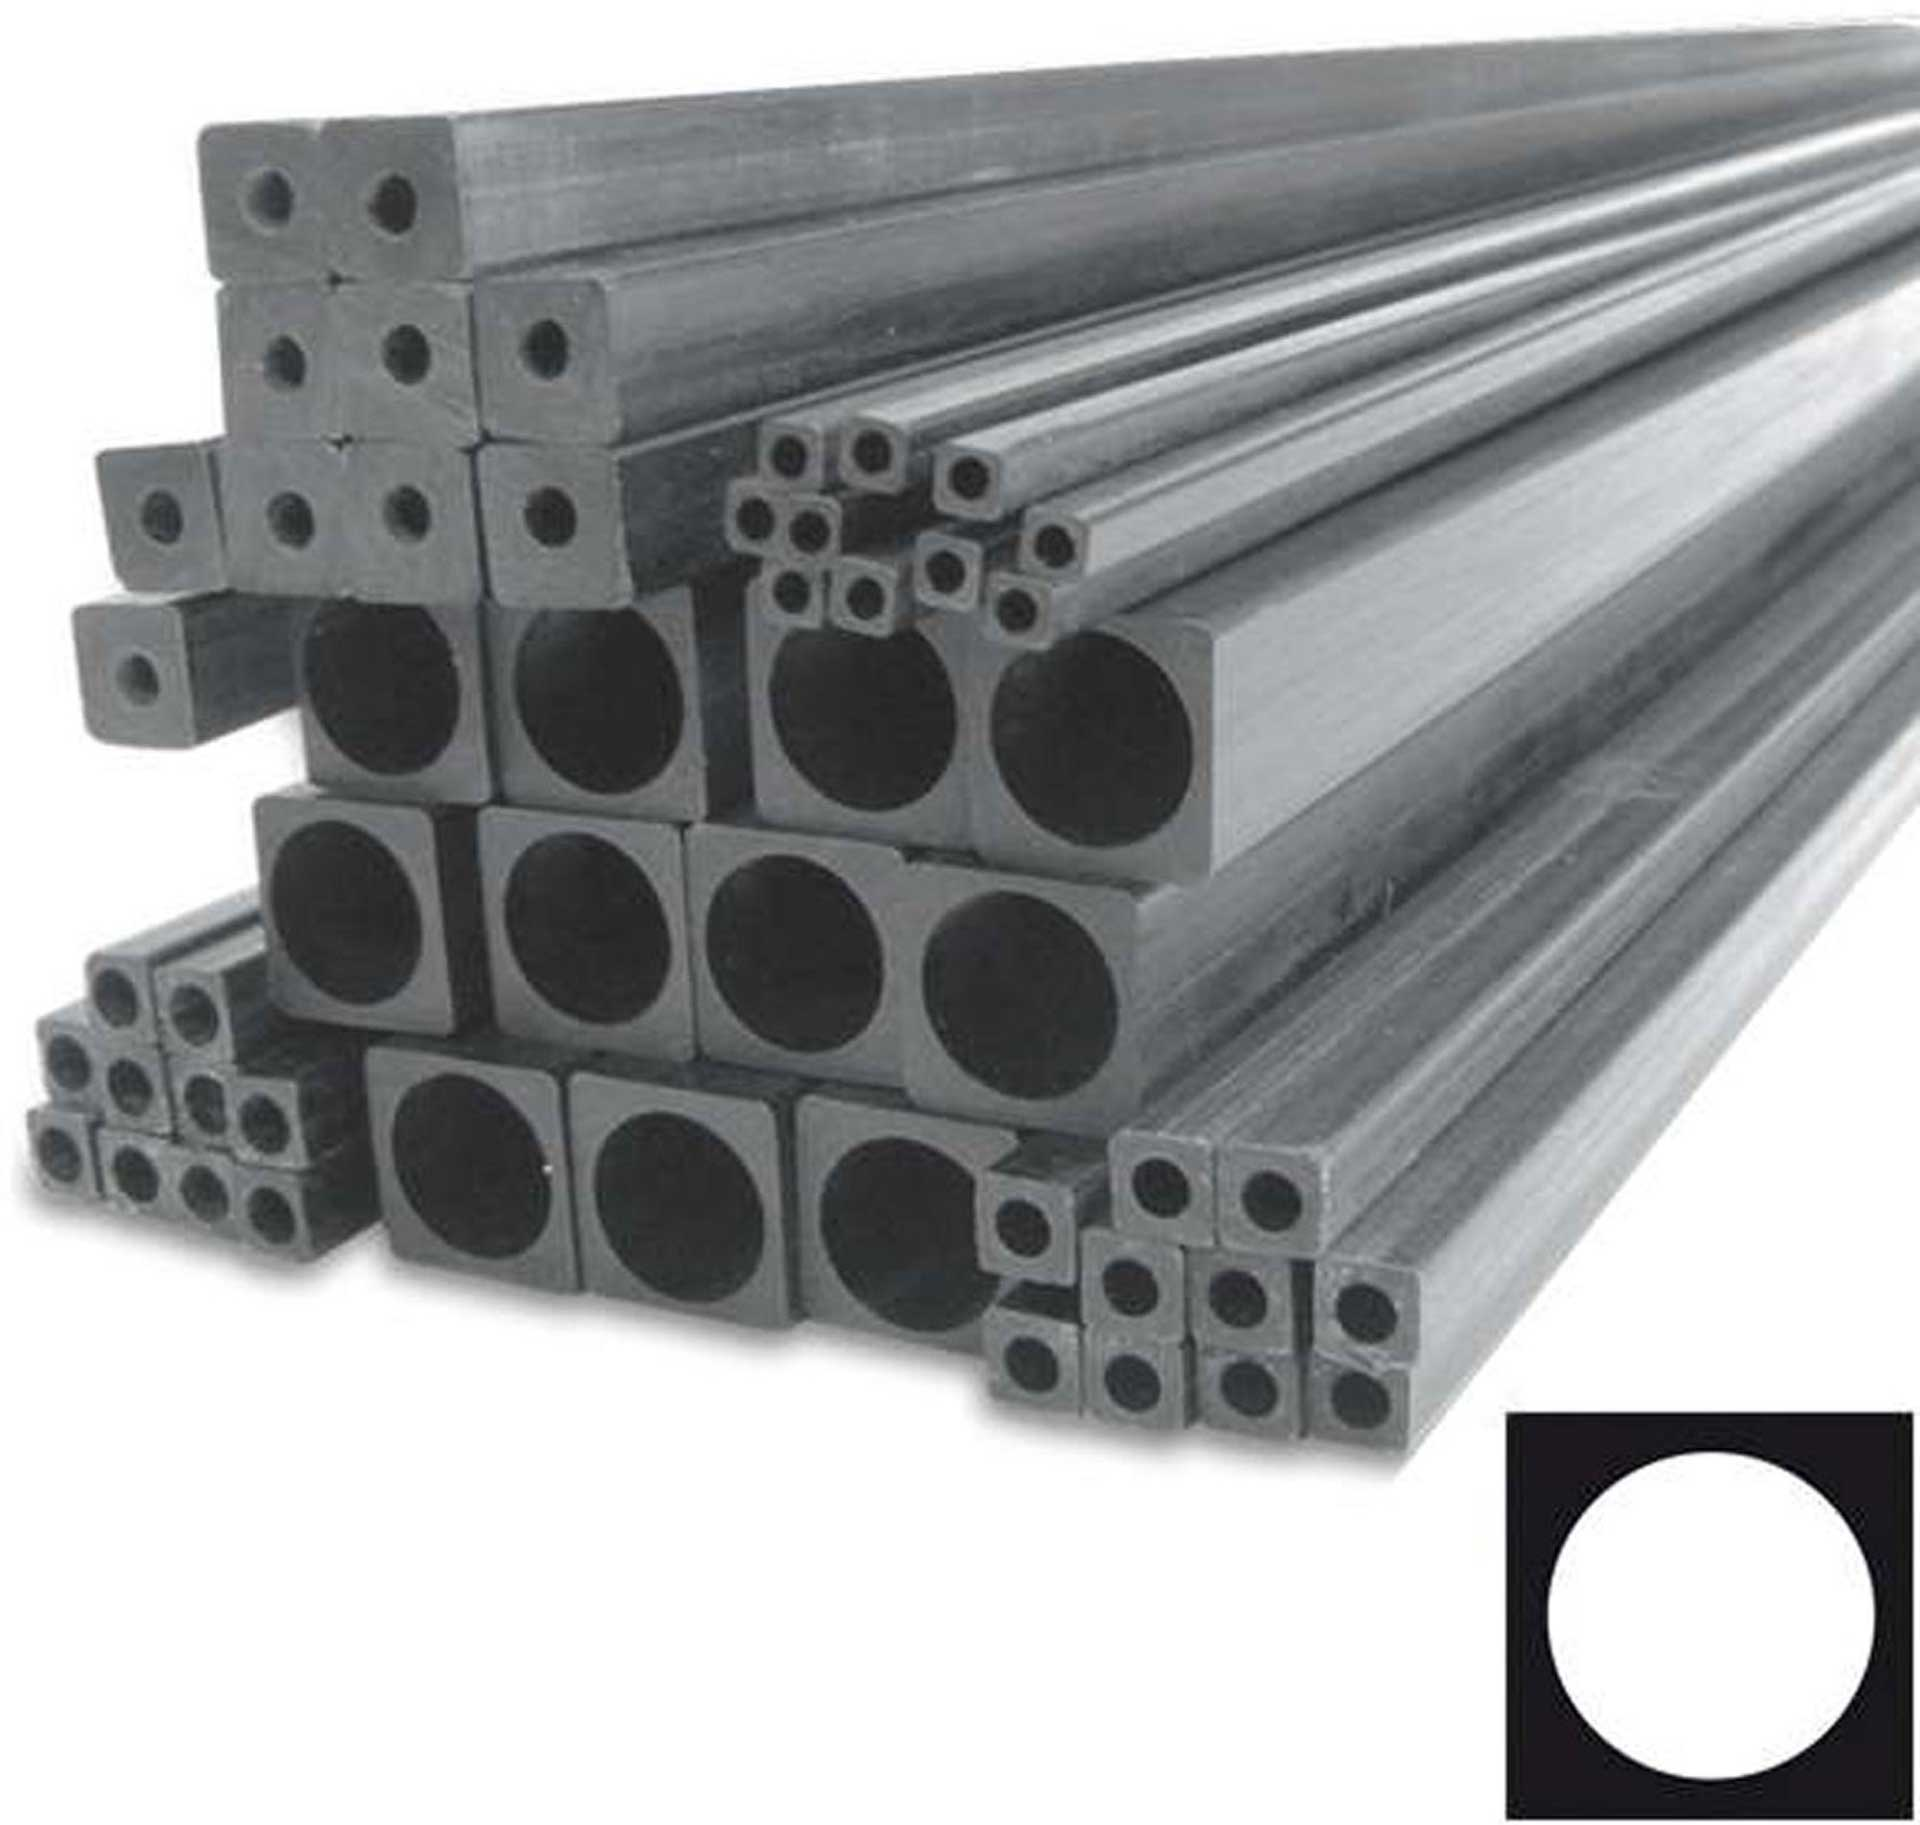 R&G CFK-Quadratrohr, innen rund (6,1 x 6,1 / Ø 5,0 x 1000 mm)